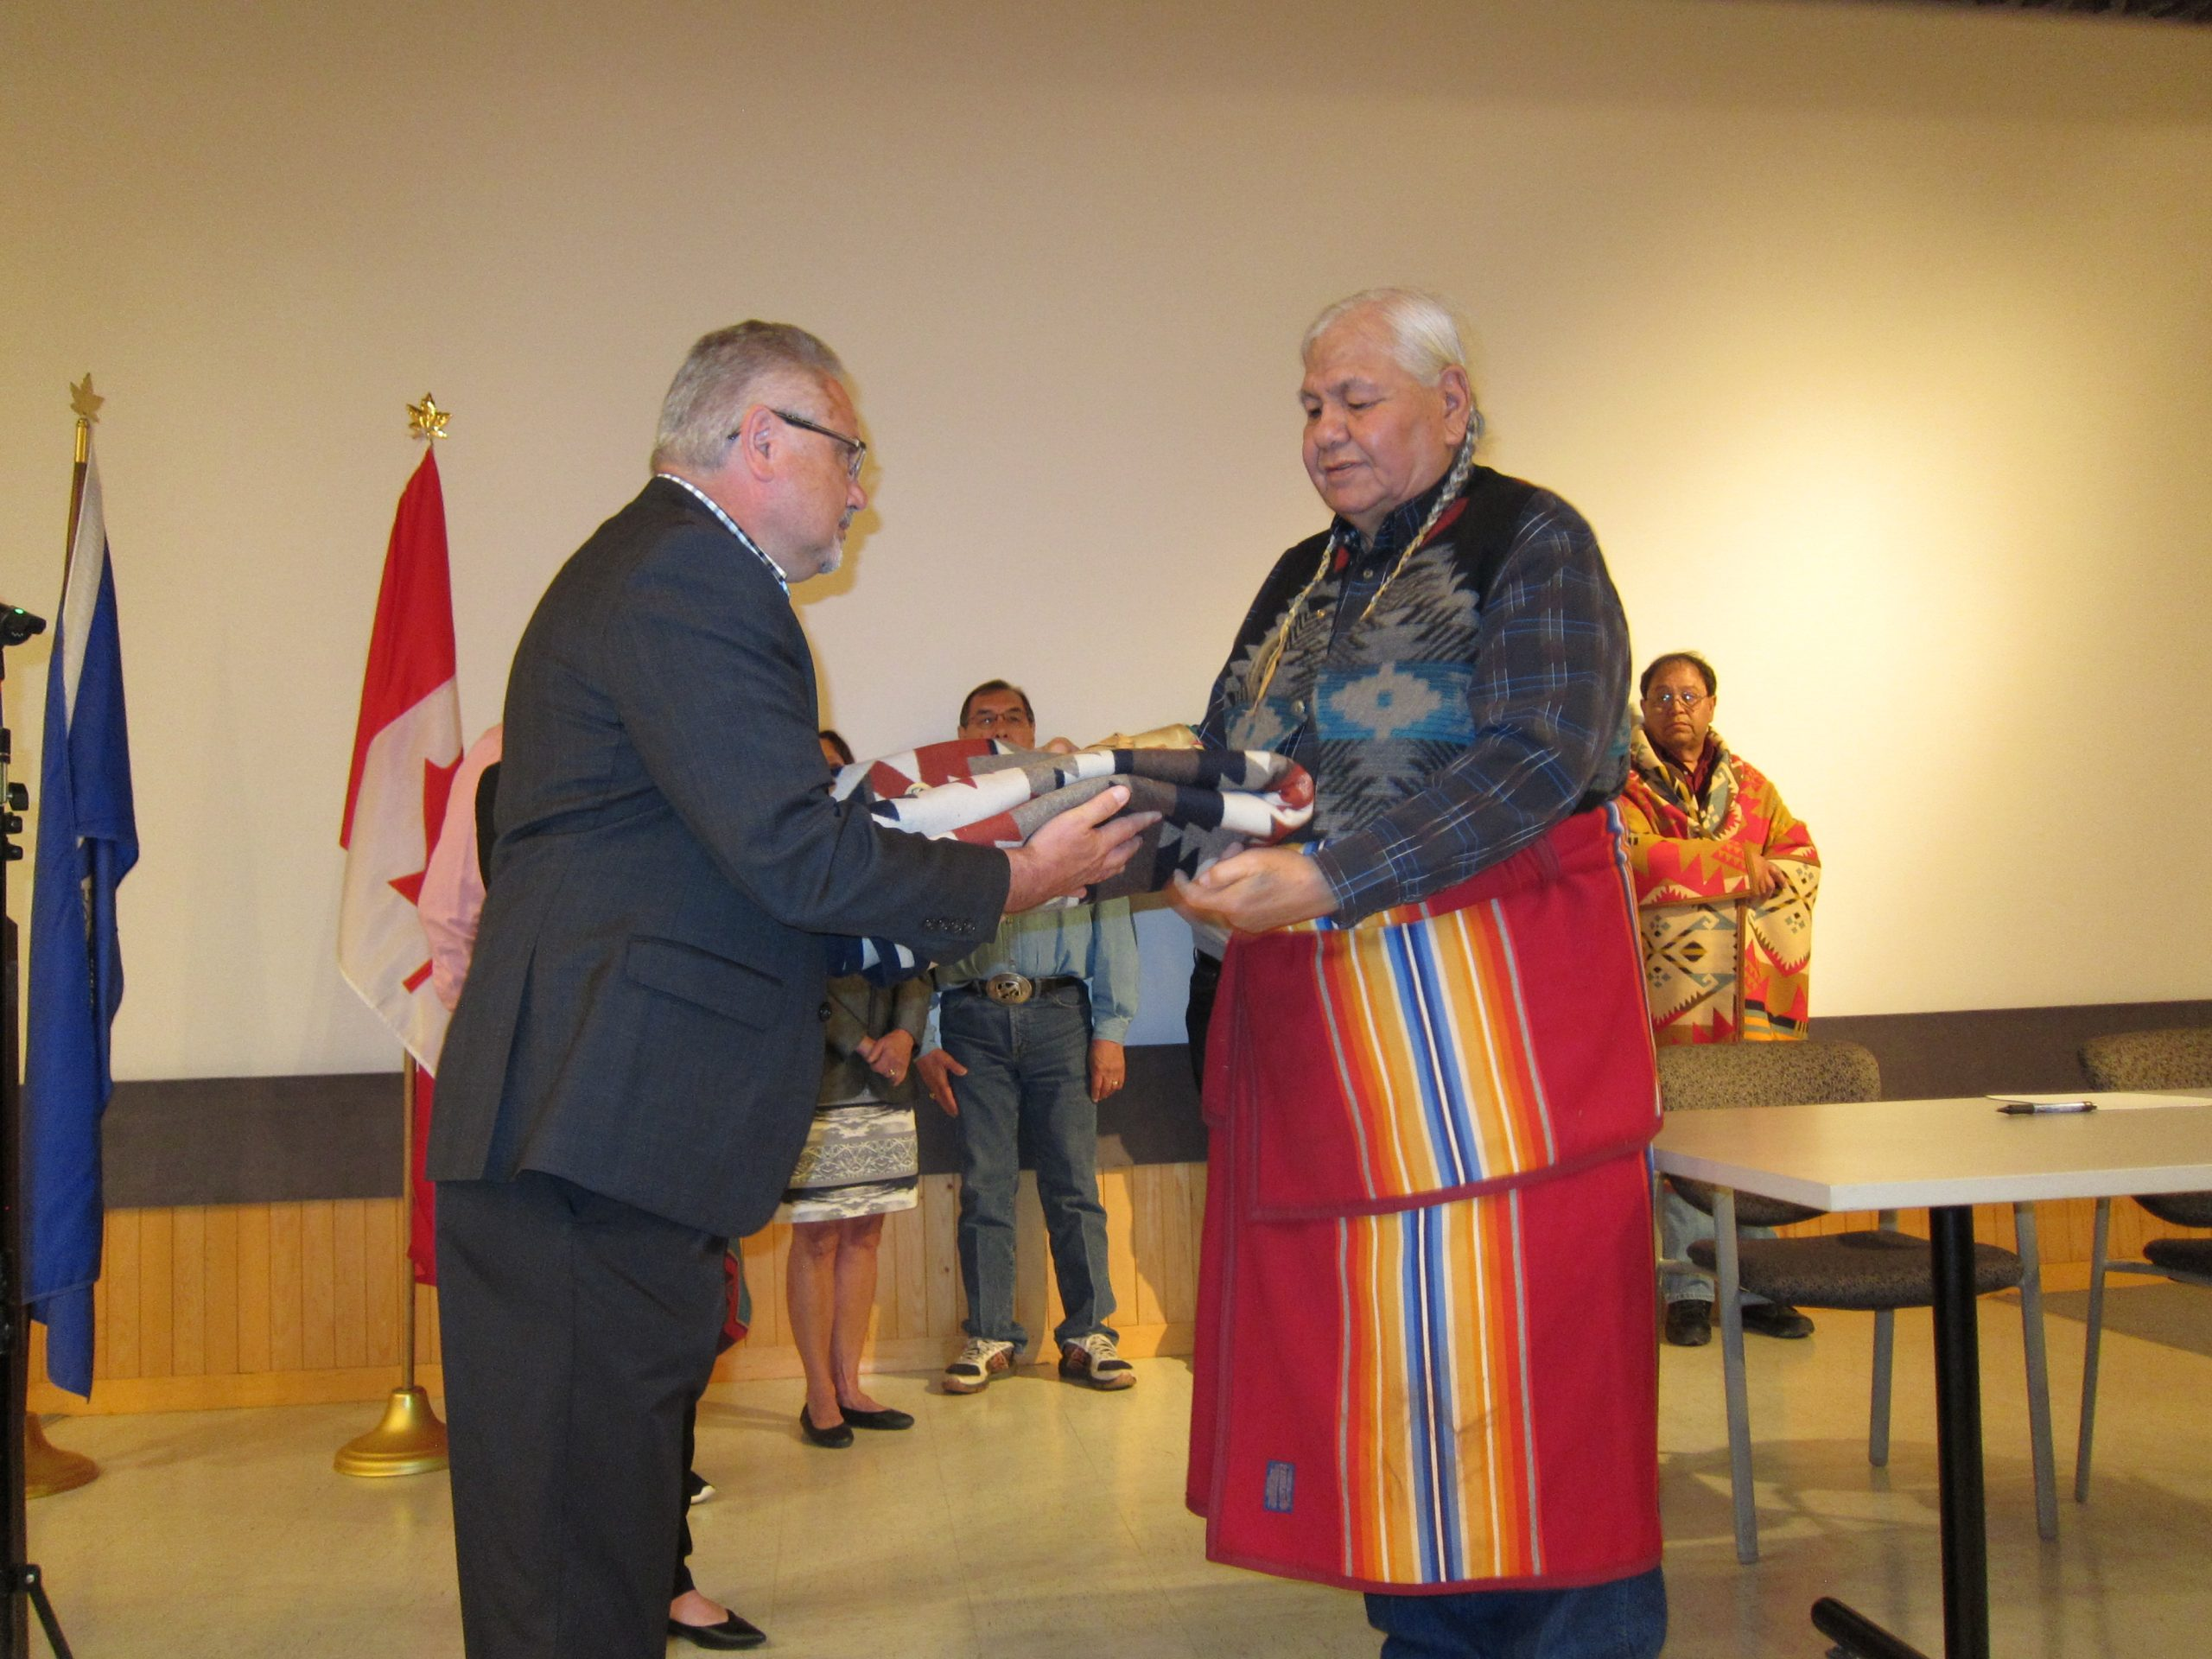 Province Announces New Indigenous Environmental Advisory Panel